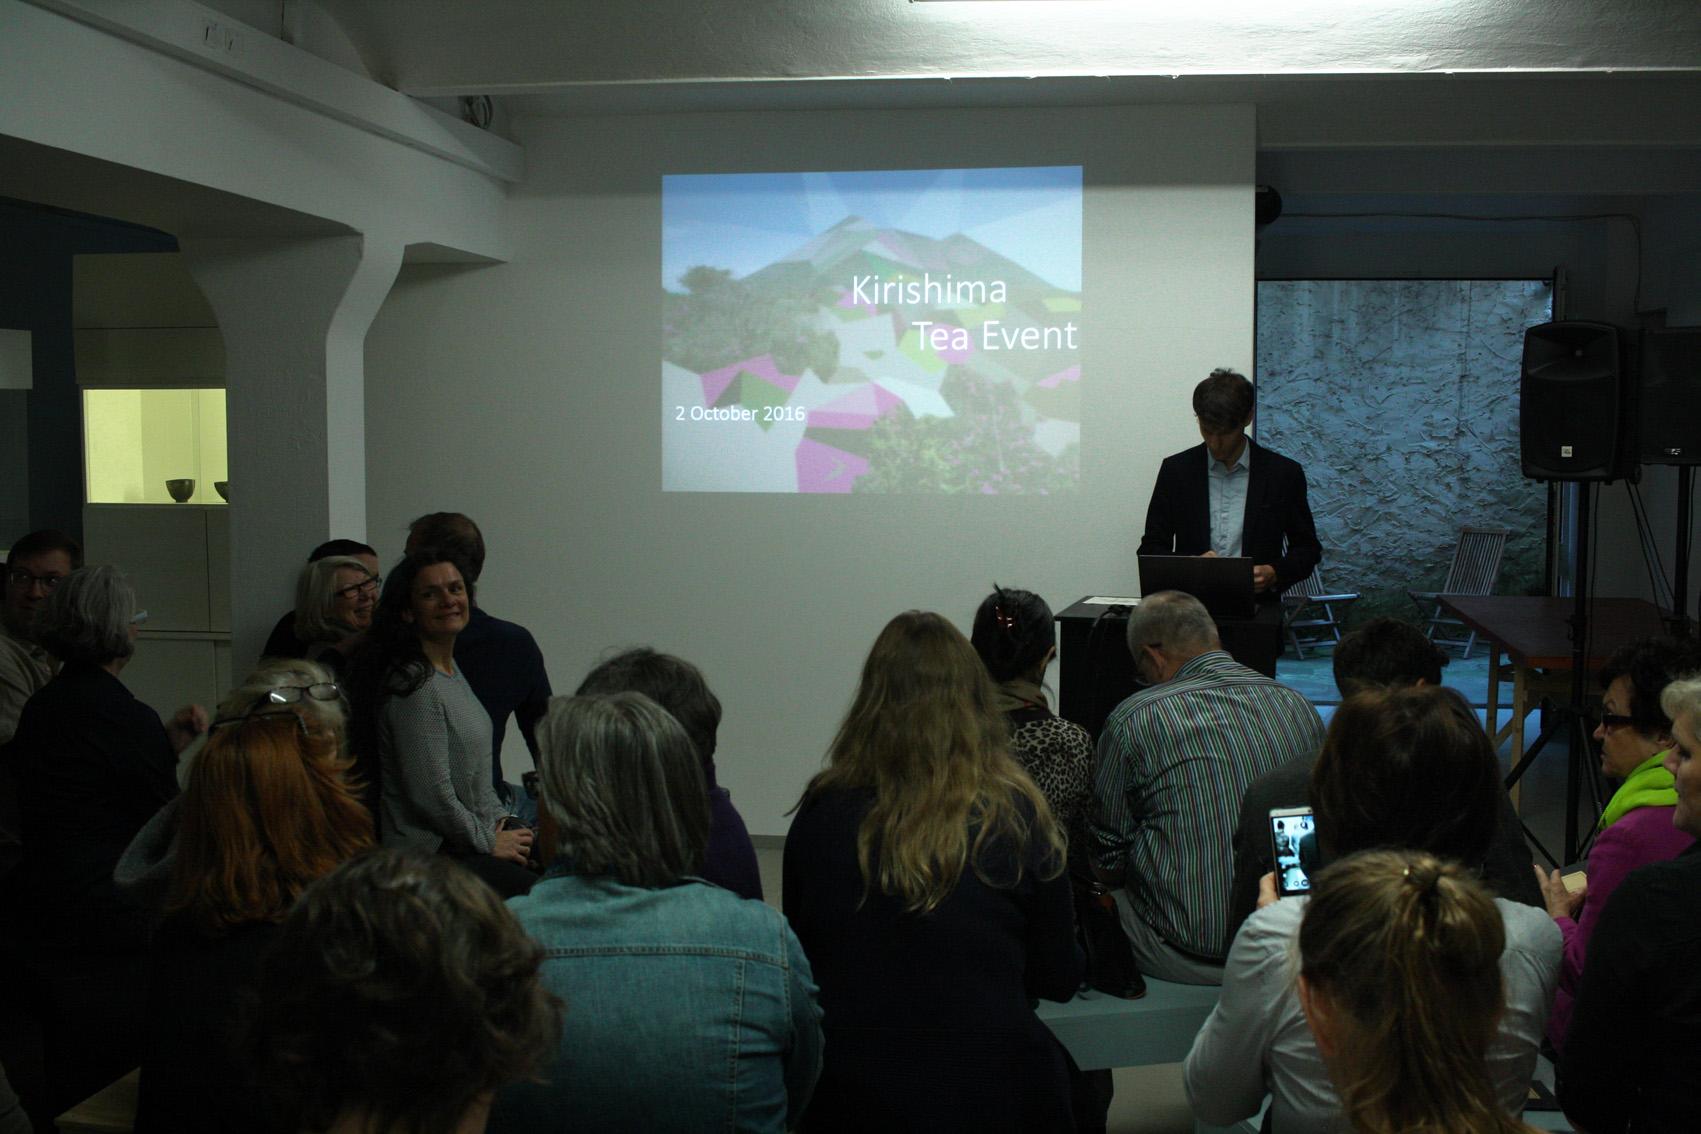 Presentation at the Kirishima Tea Event 2016